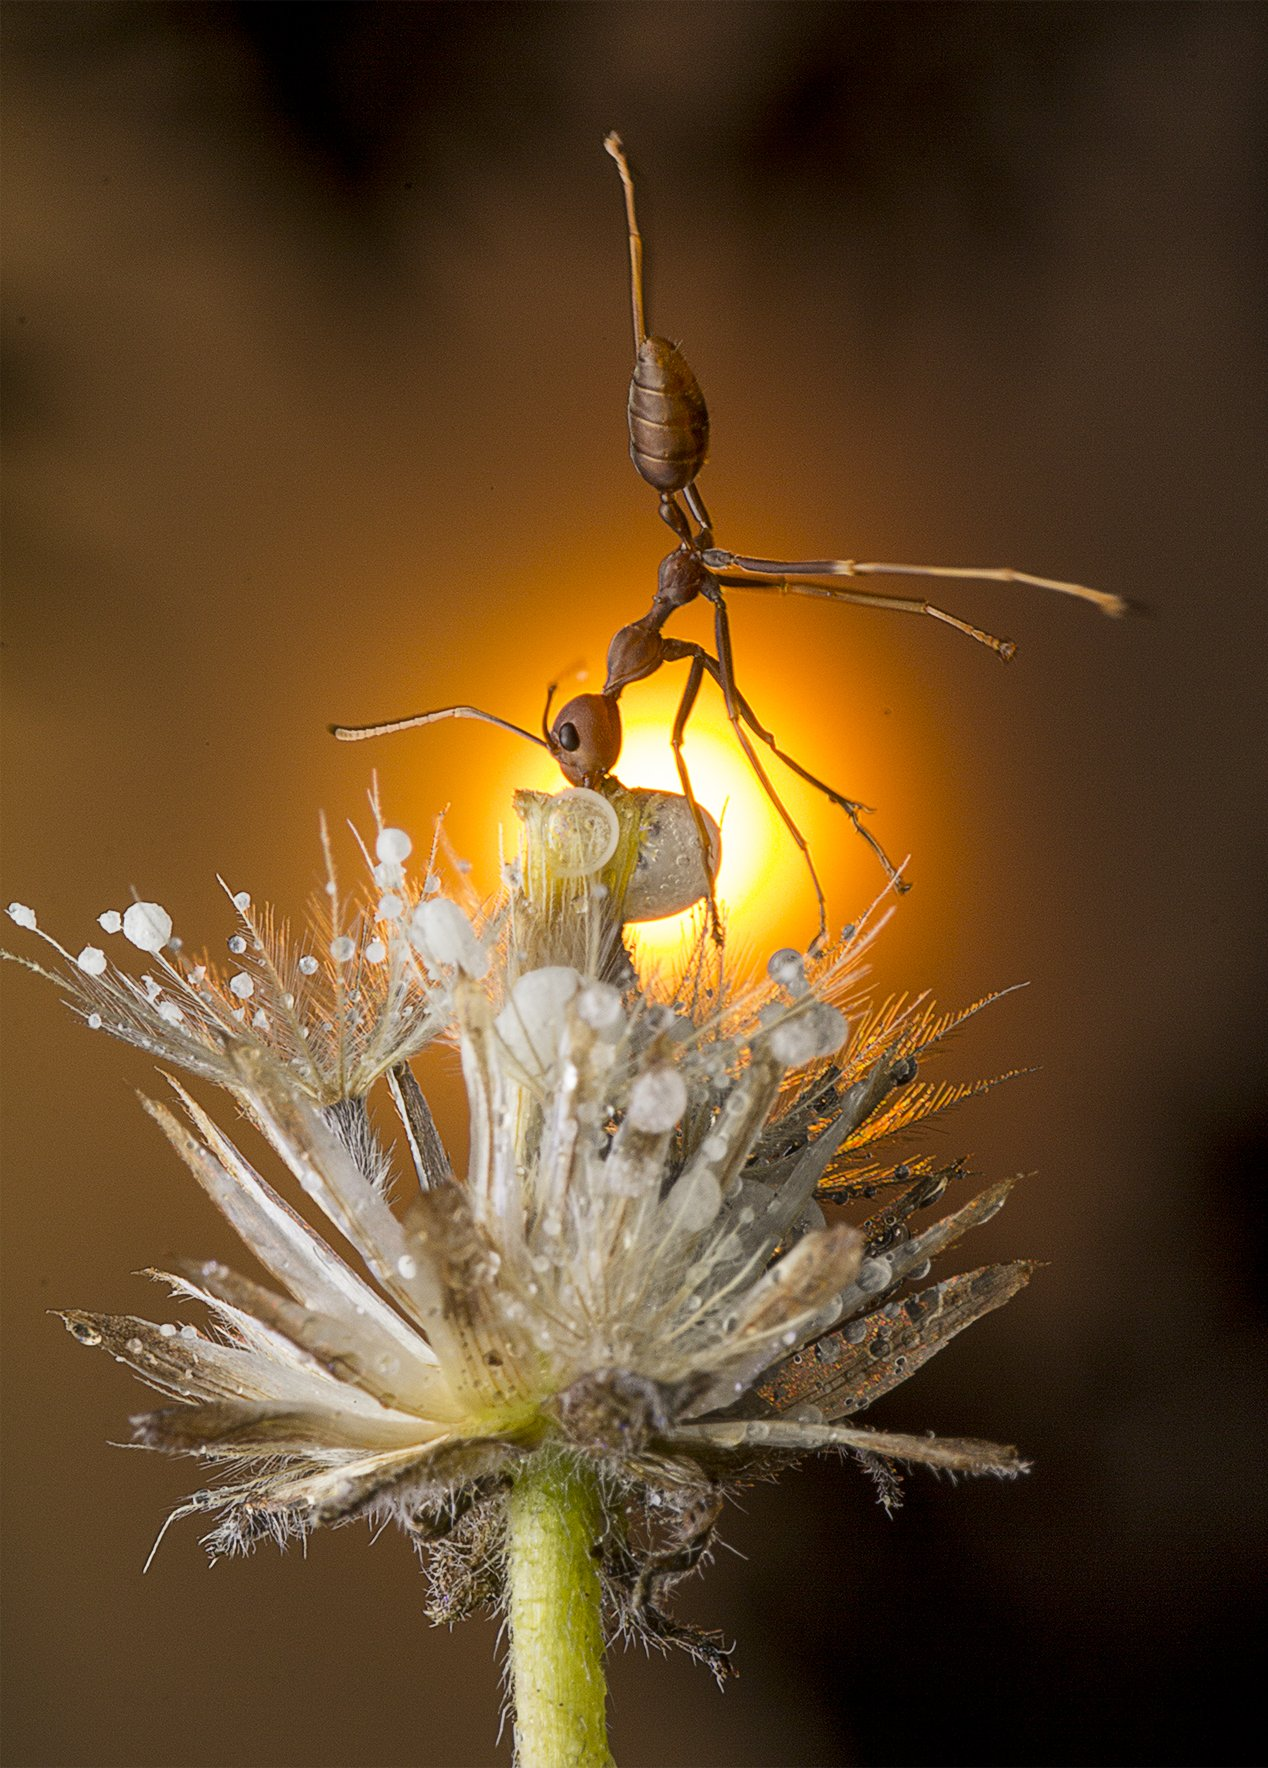 #macro#ant#sunset#colors, Lim Choo How